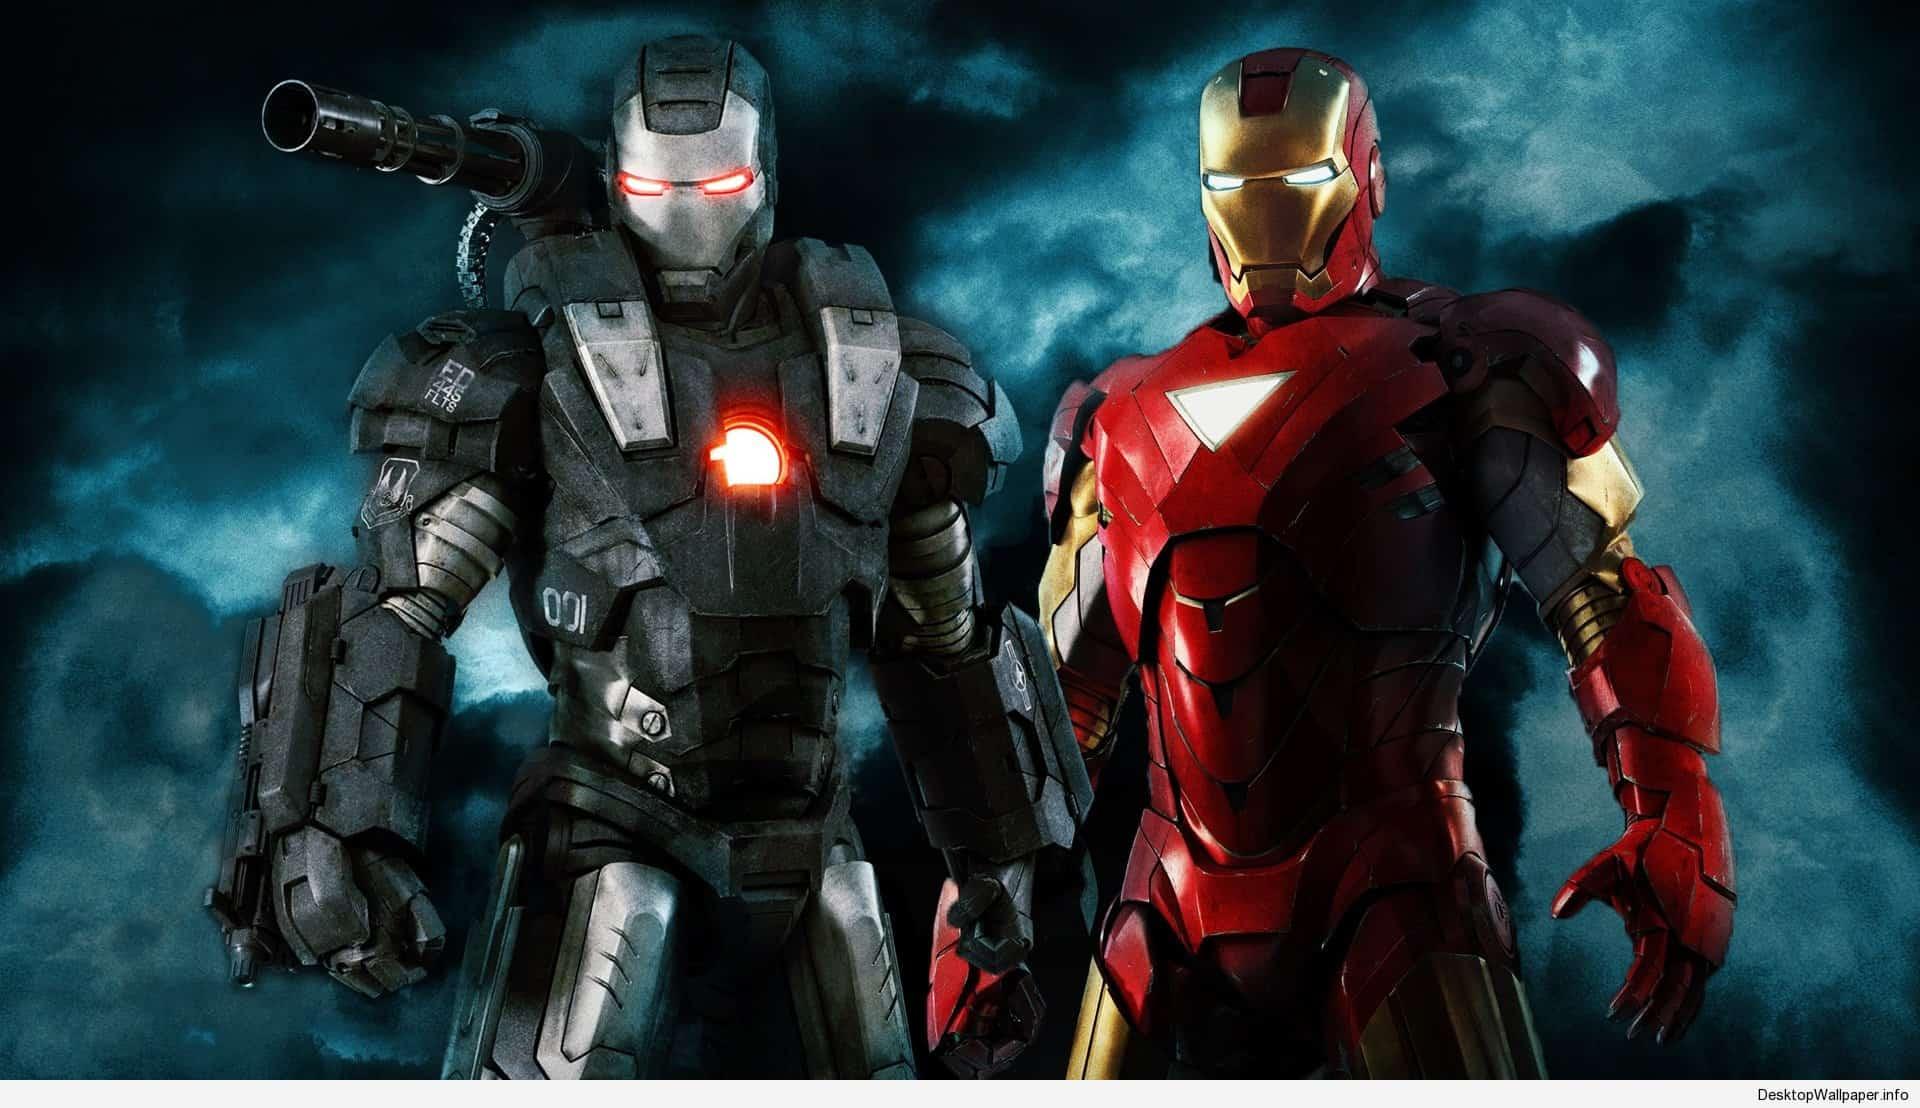 iron man 3 hd wallpapers 1080p - wallpaper cave